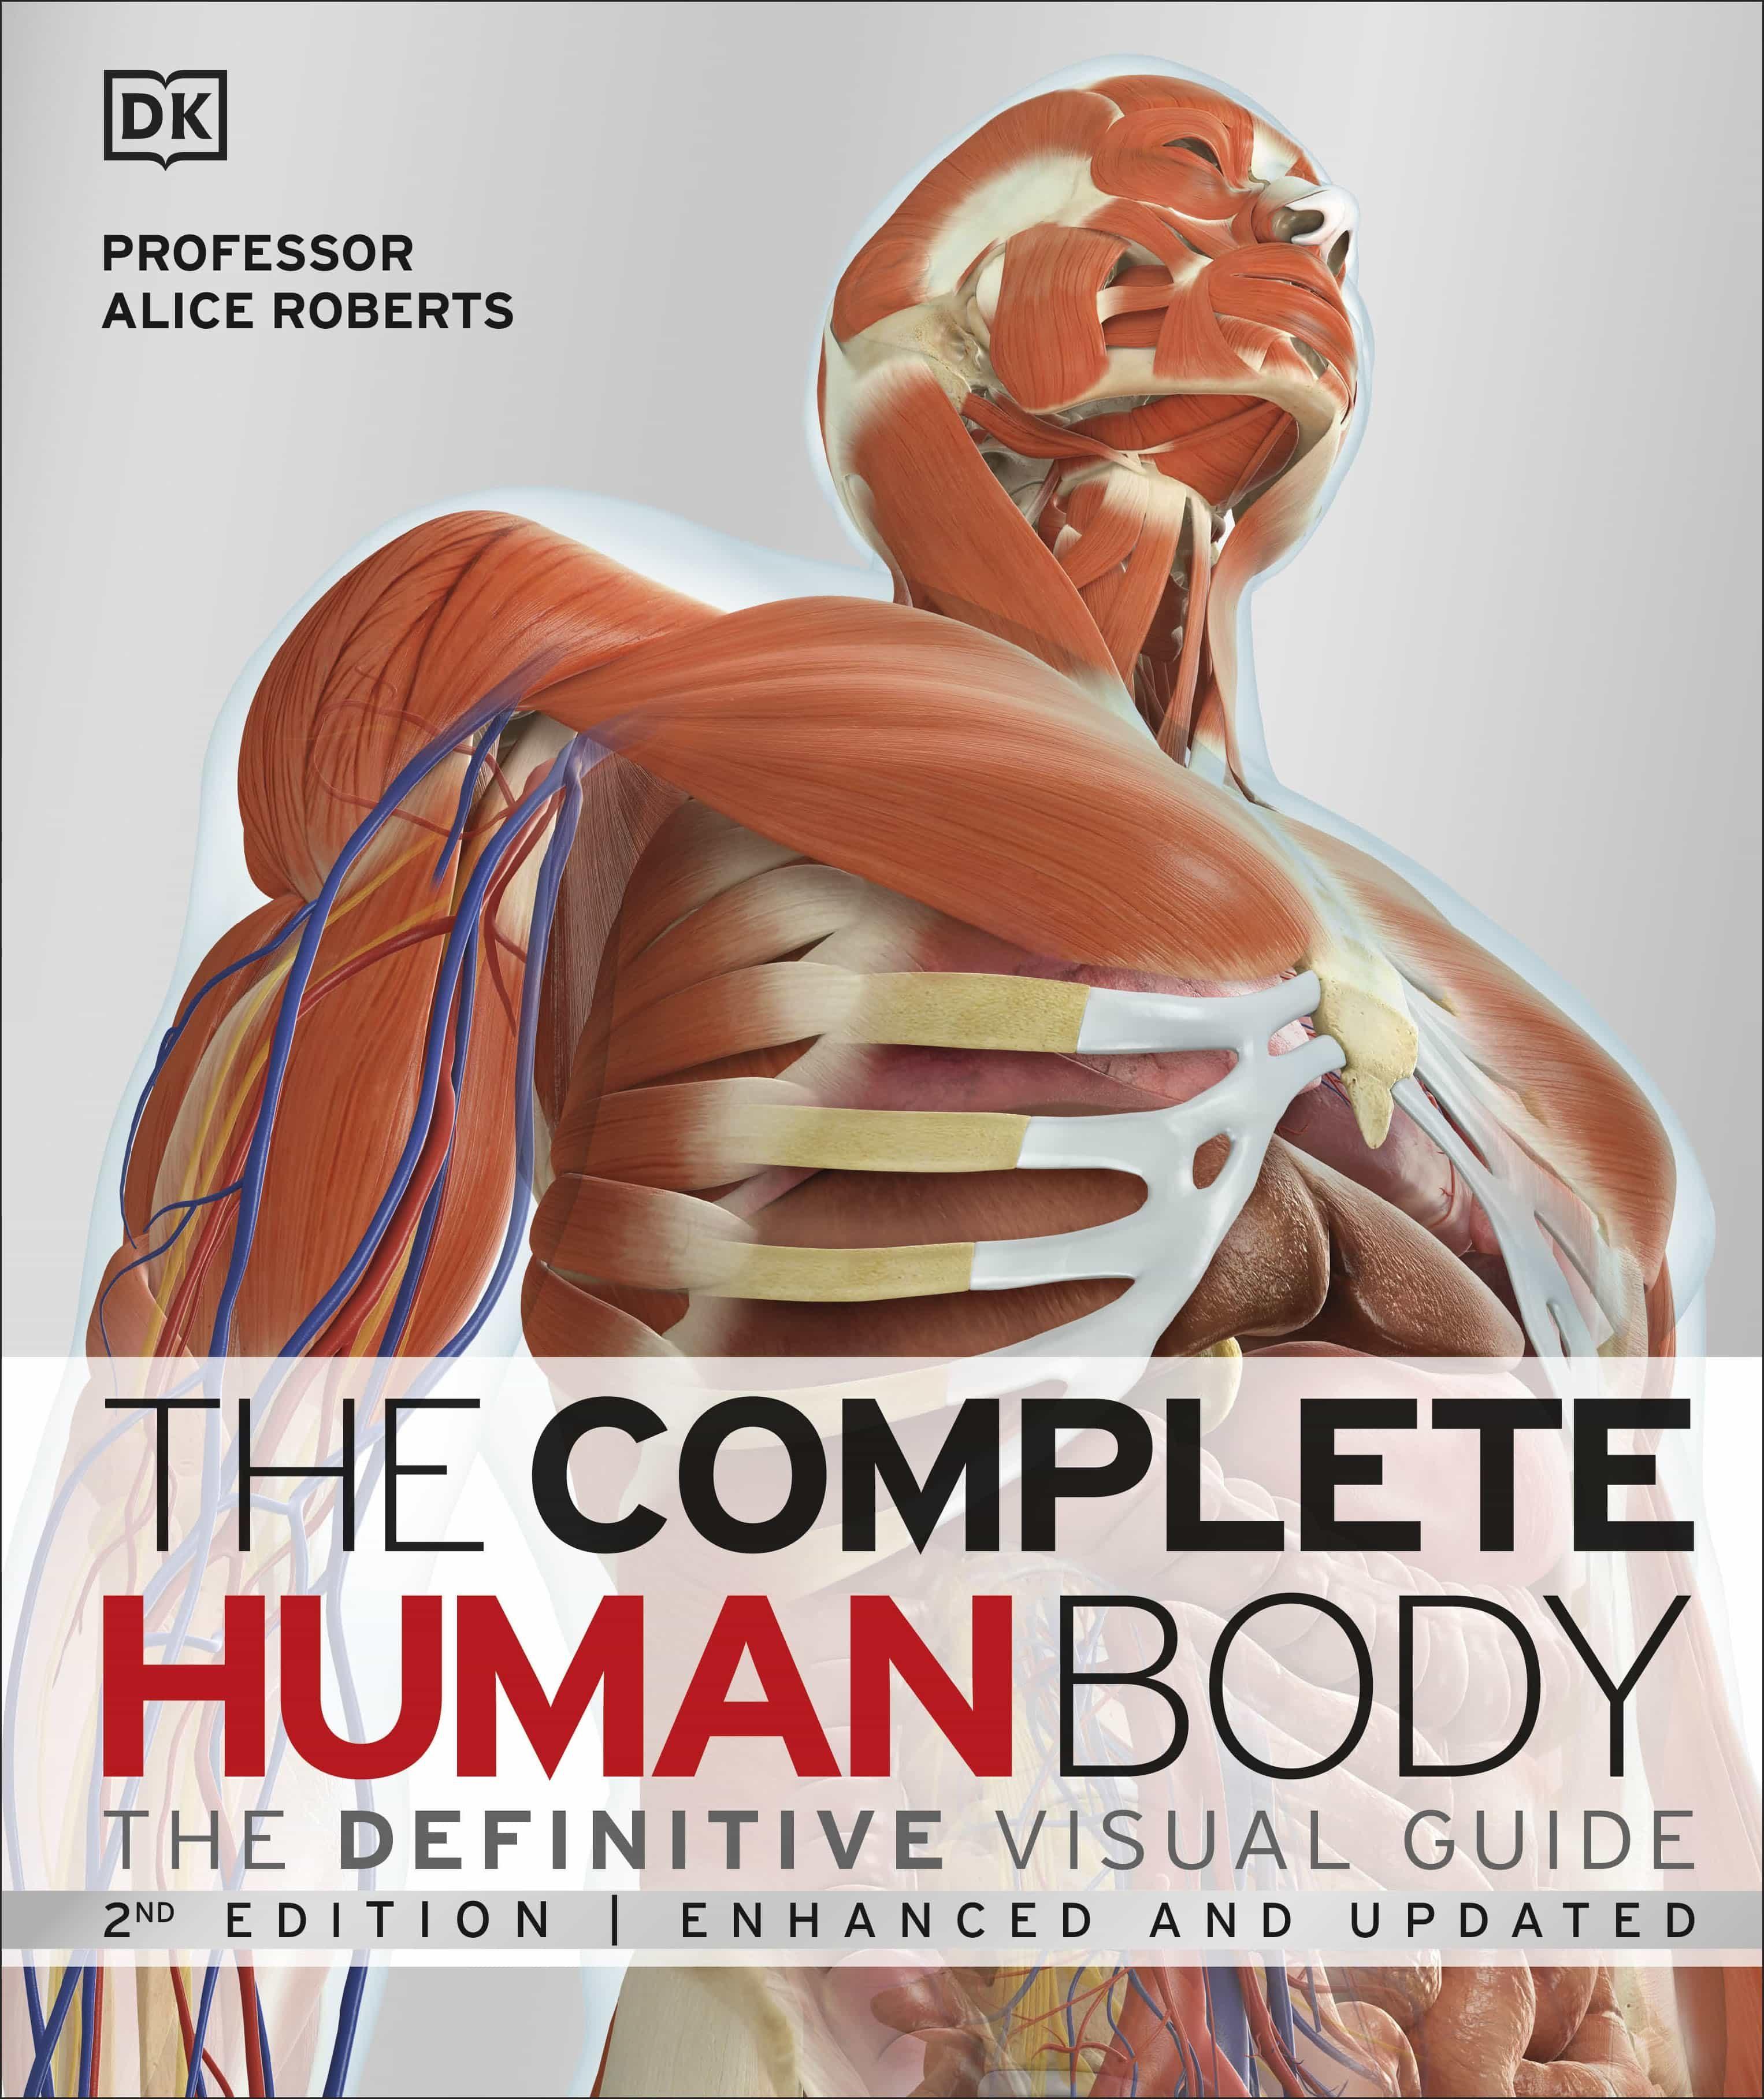 THE COMPLETE HUMAN BODY EBOOK | DR ALICE ROBERTS | Descargar libro ...